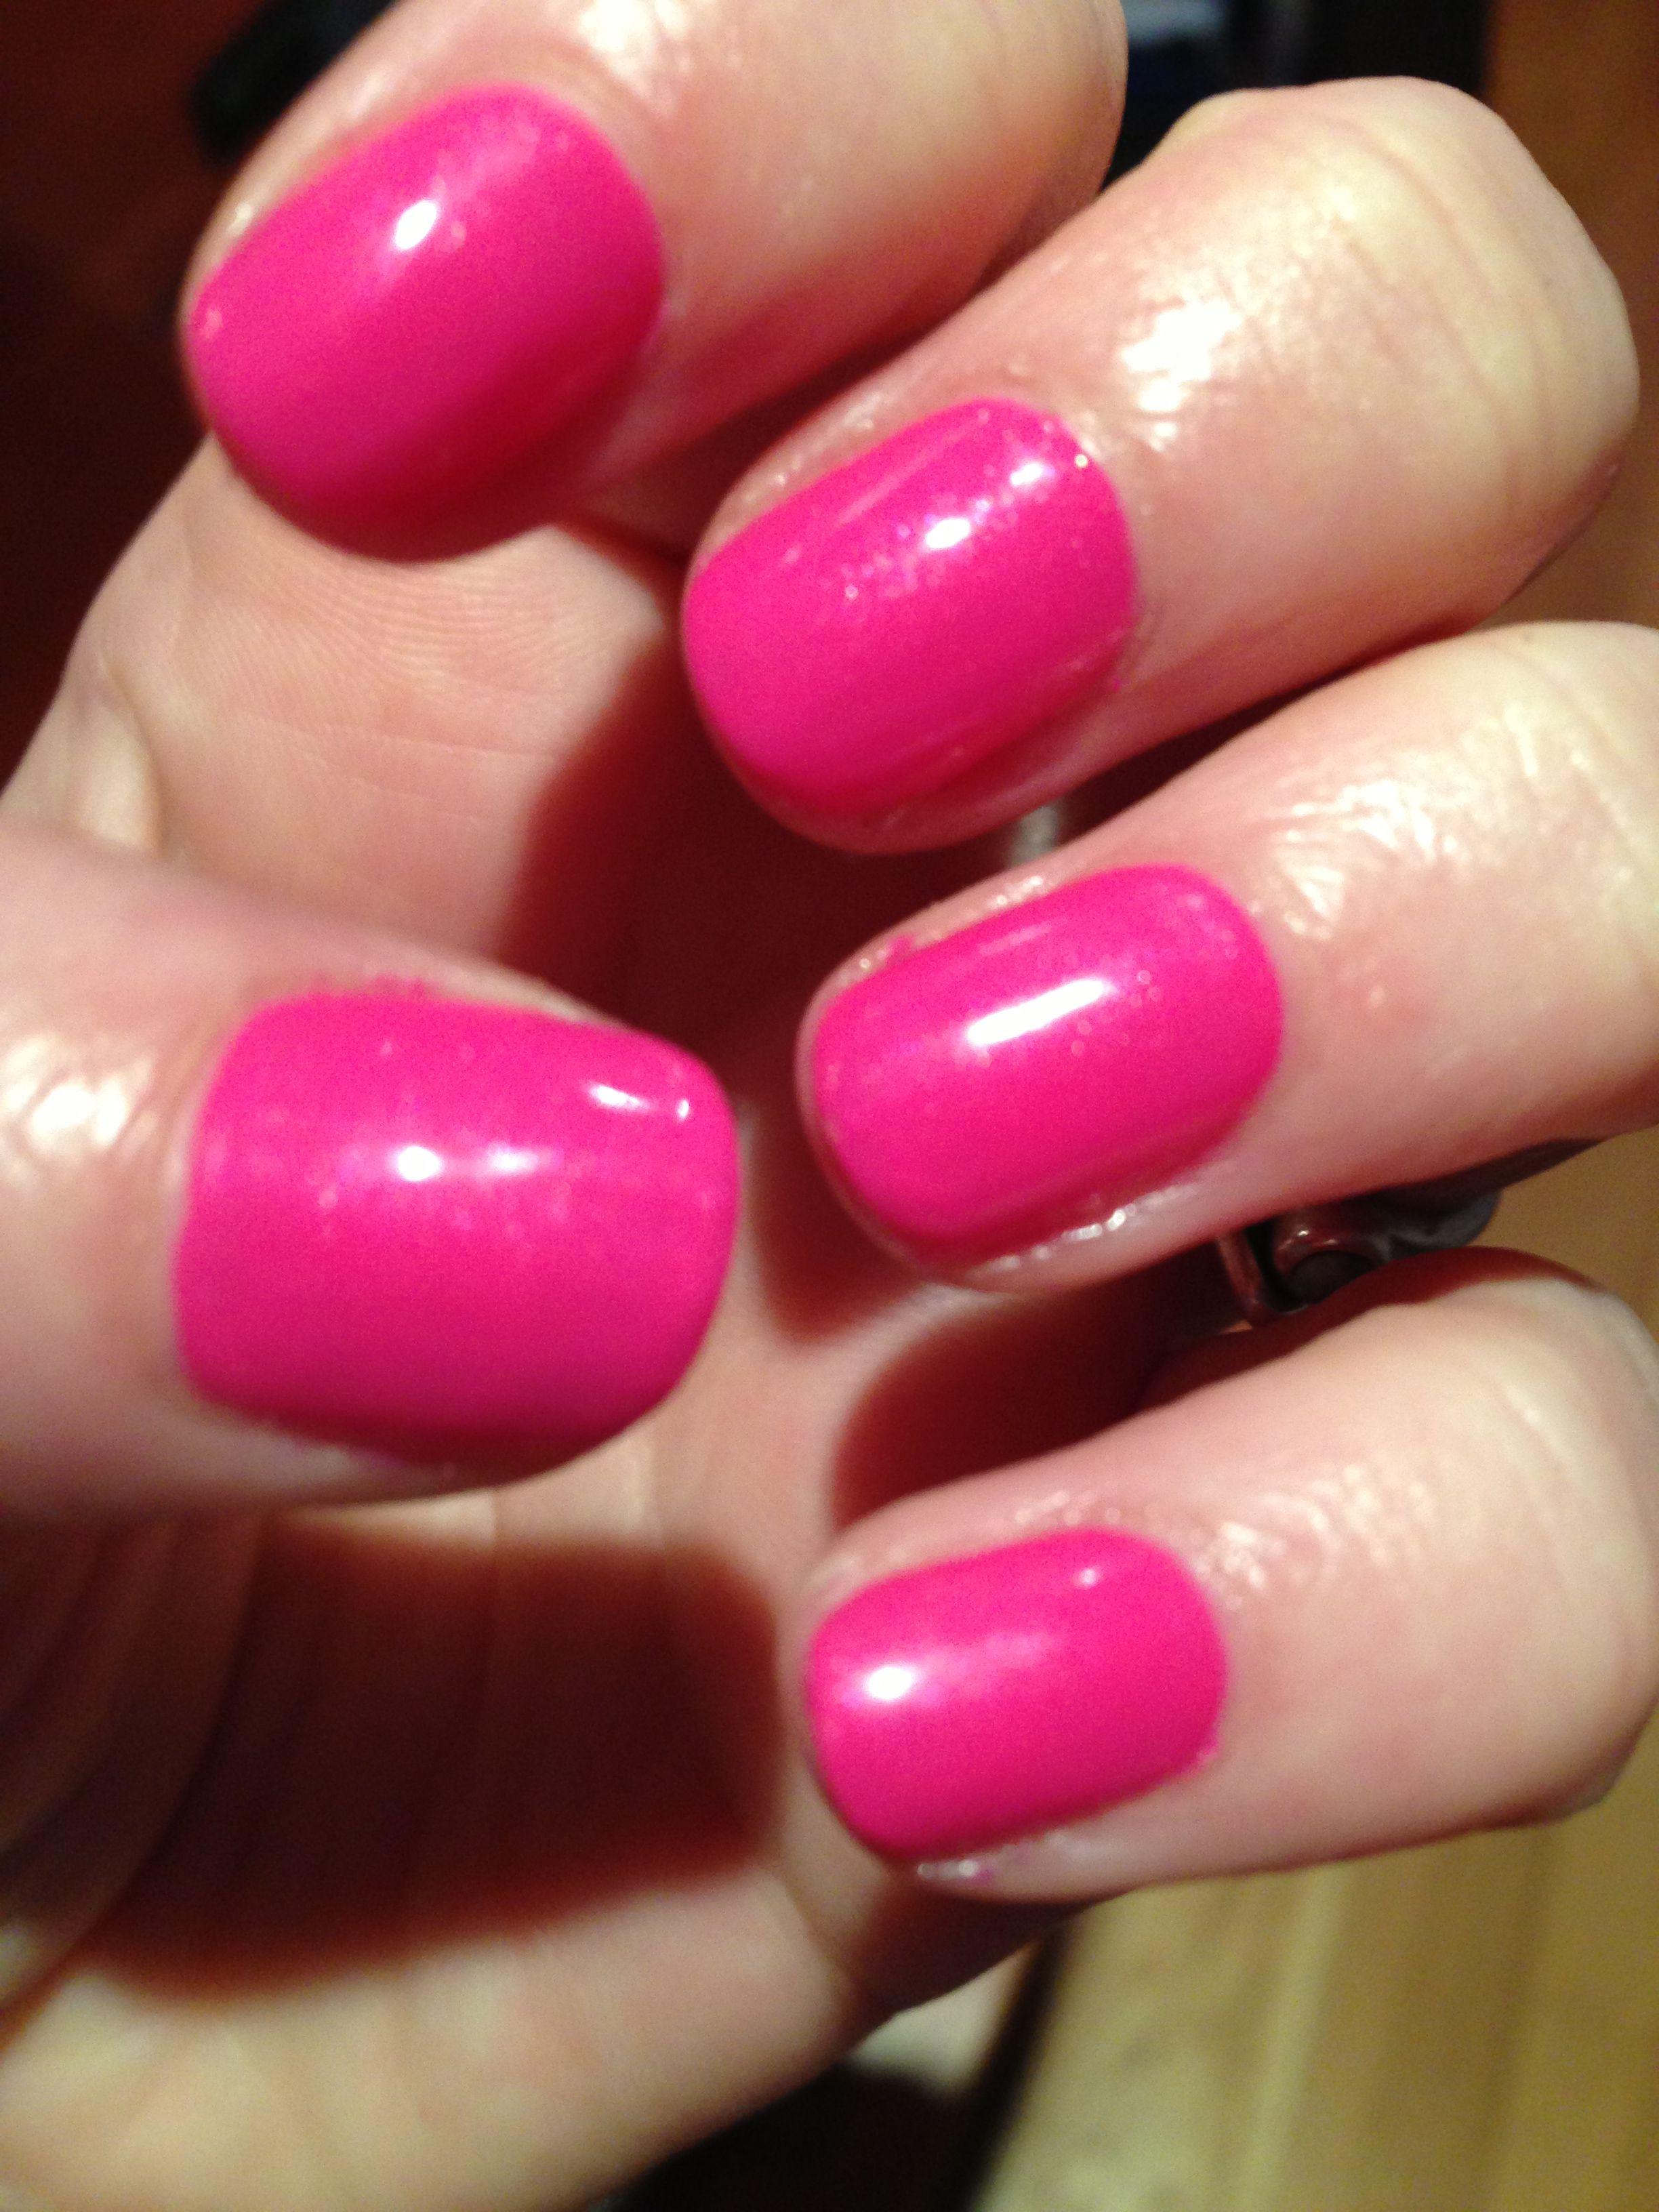 Smitten kitten | Jessica GELeration nails by me! | Pinterest